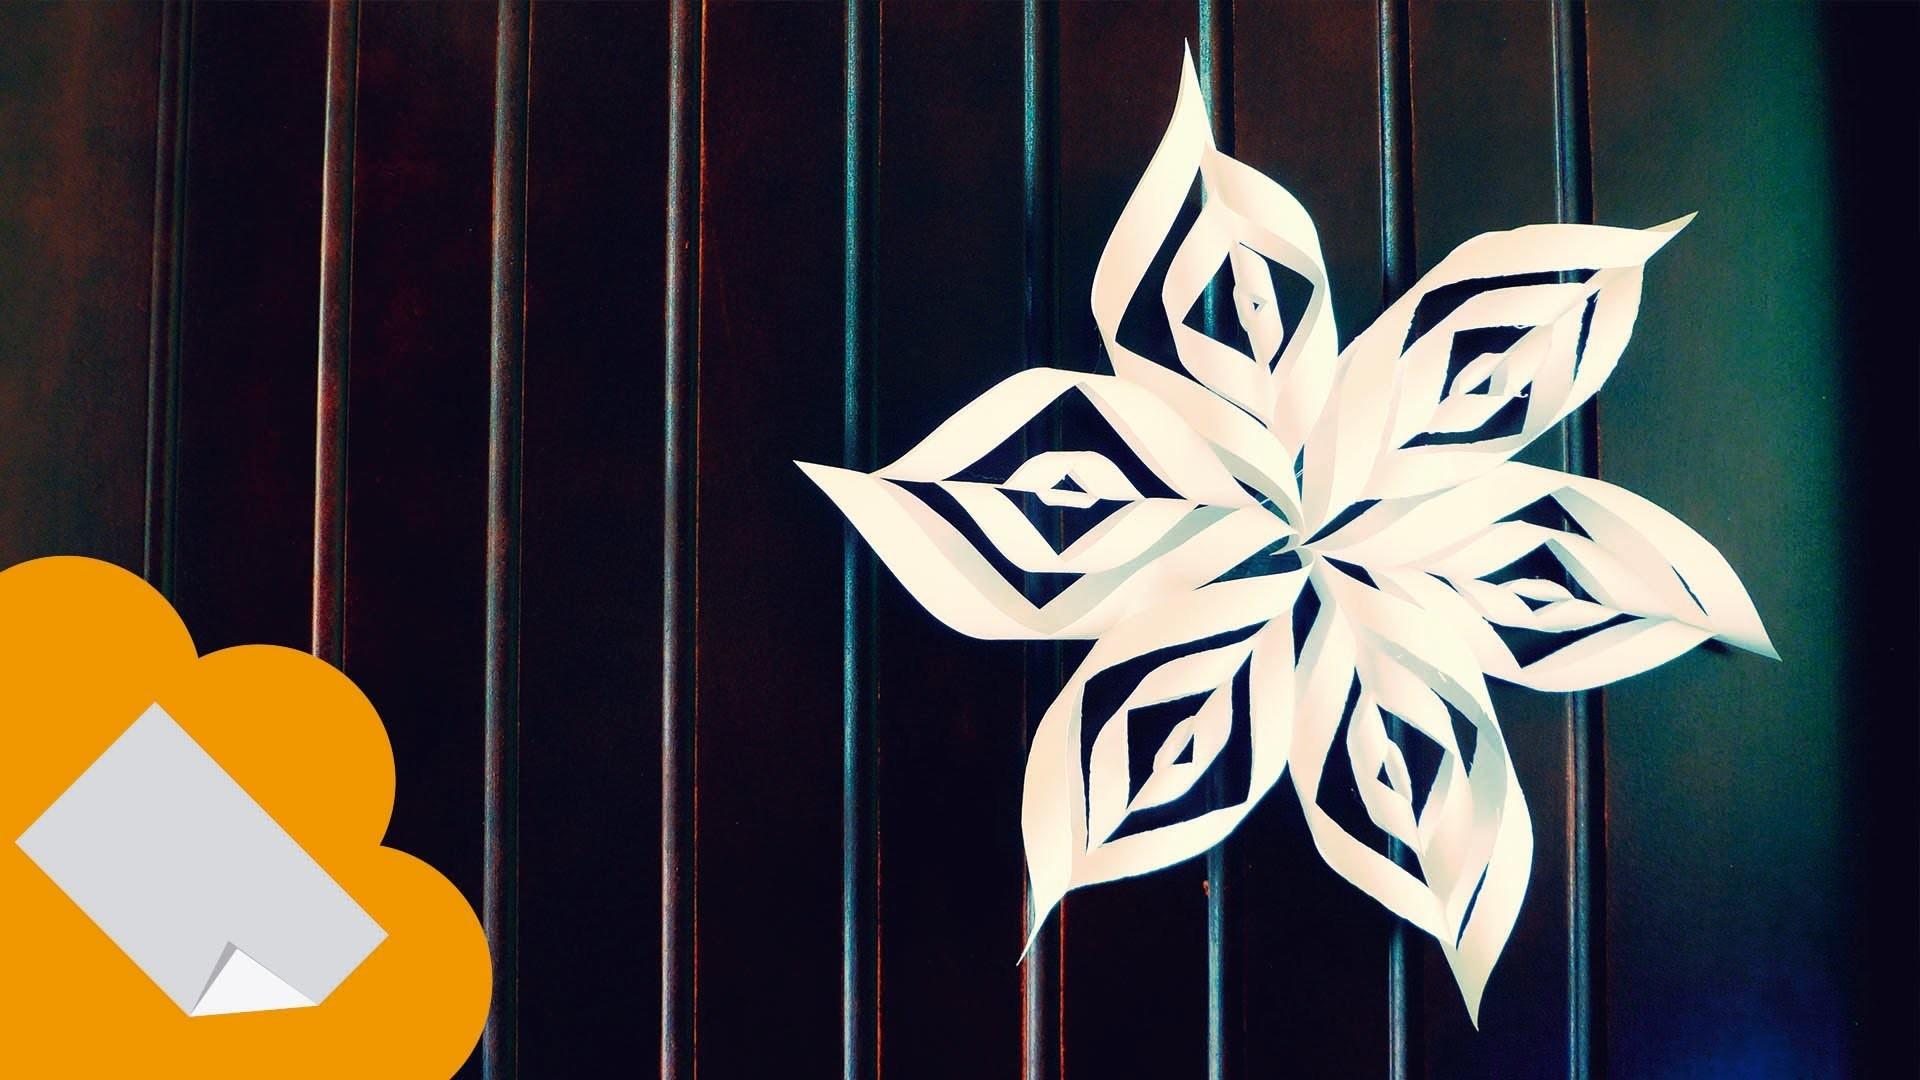 Copo de nieve estrella de papel